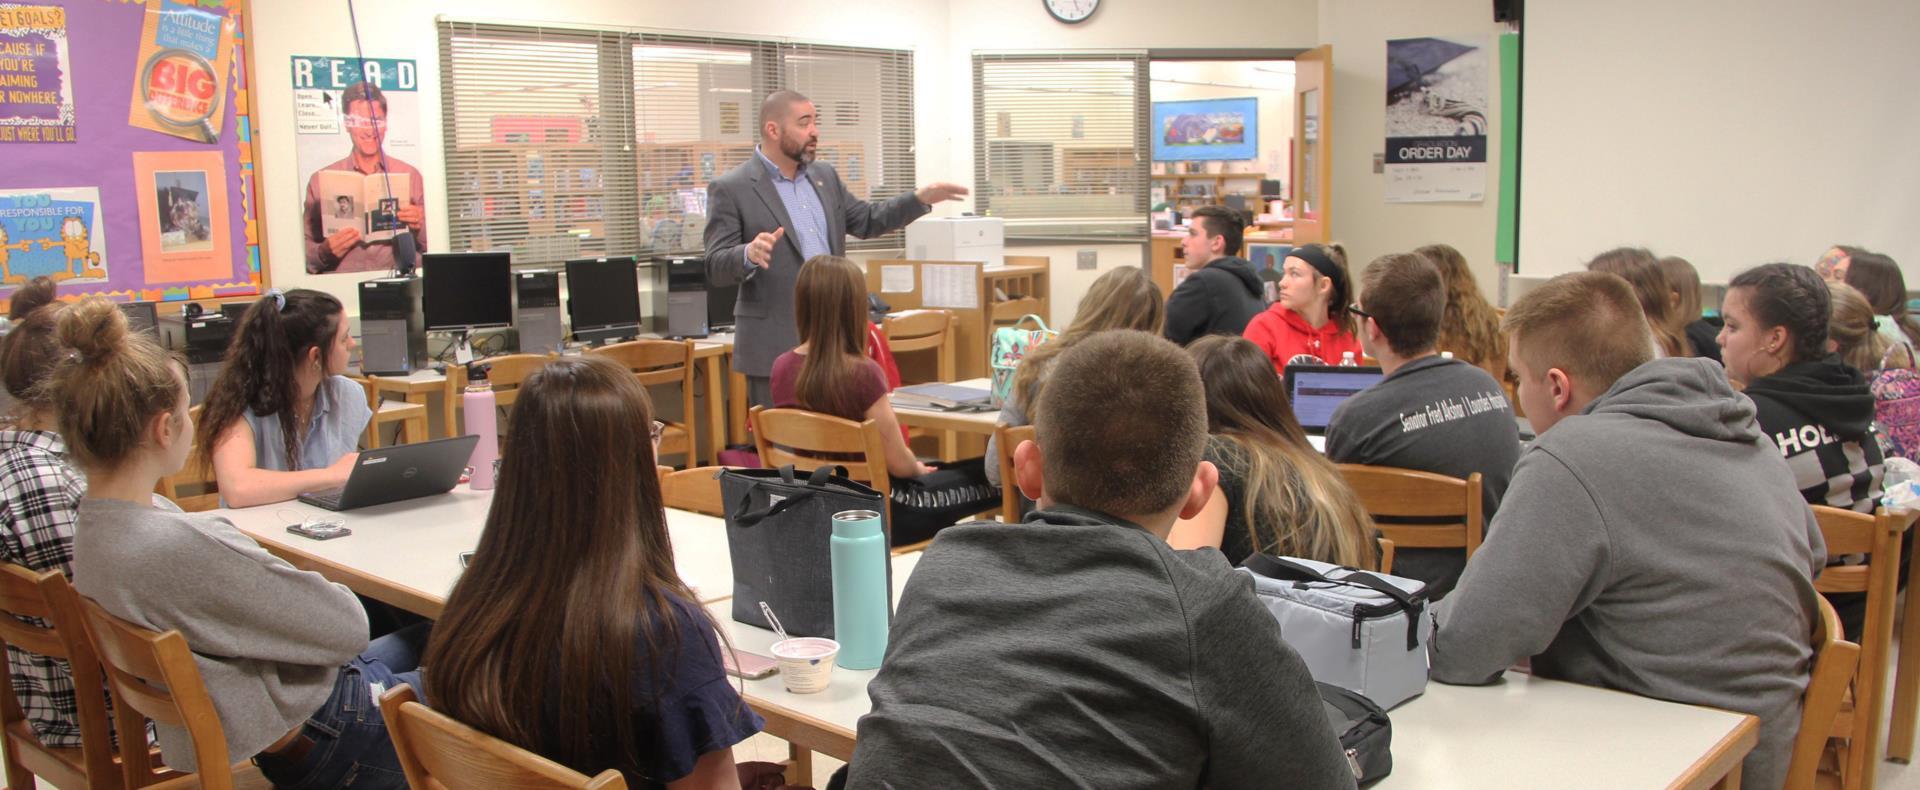 senator akshar speaking with students